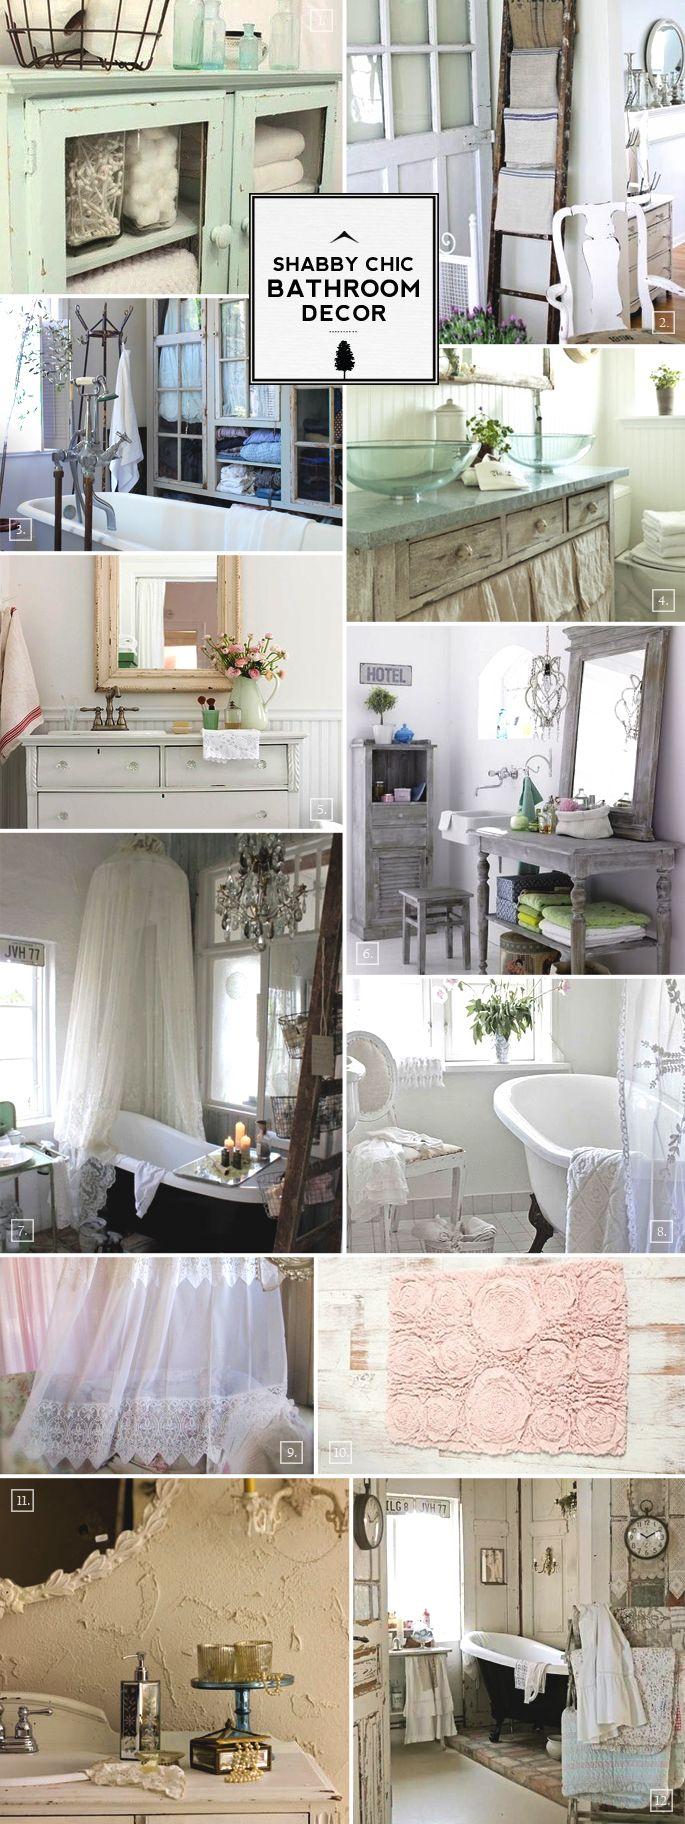 Shabby Chic Bathroom Ideas and Decor Designs